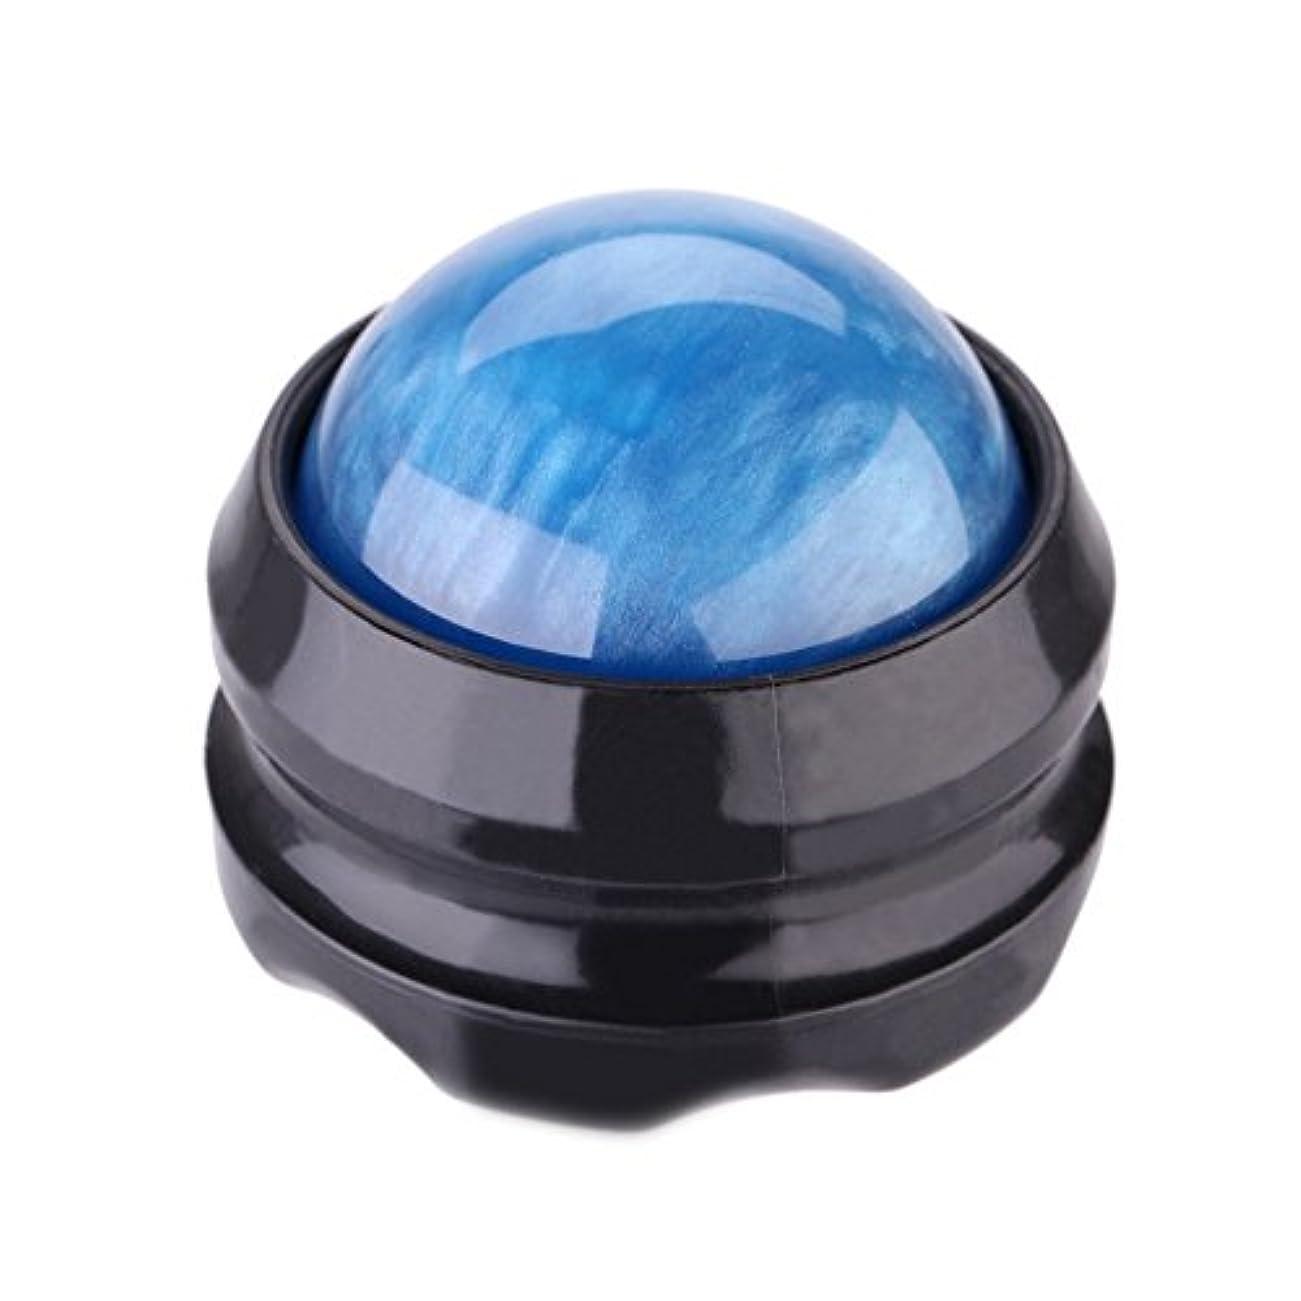 Trueland マッサージ ボール 360度回転 背中 首 腰 筋膜リリース 健康器具 (青)